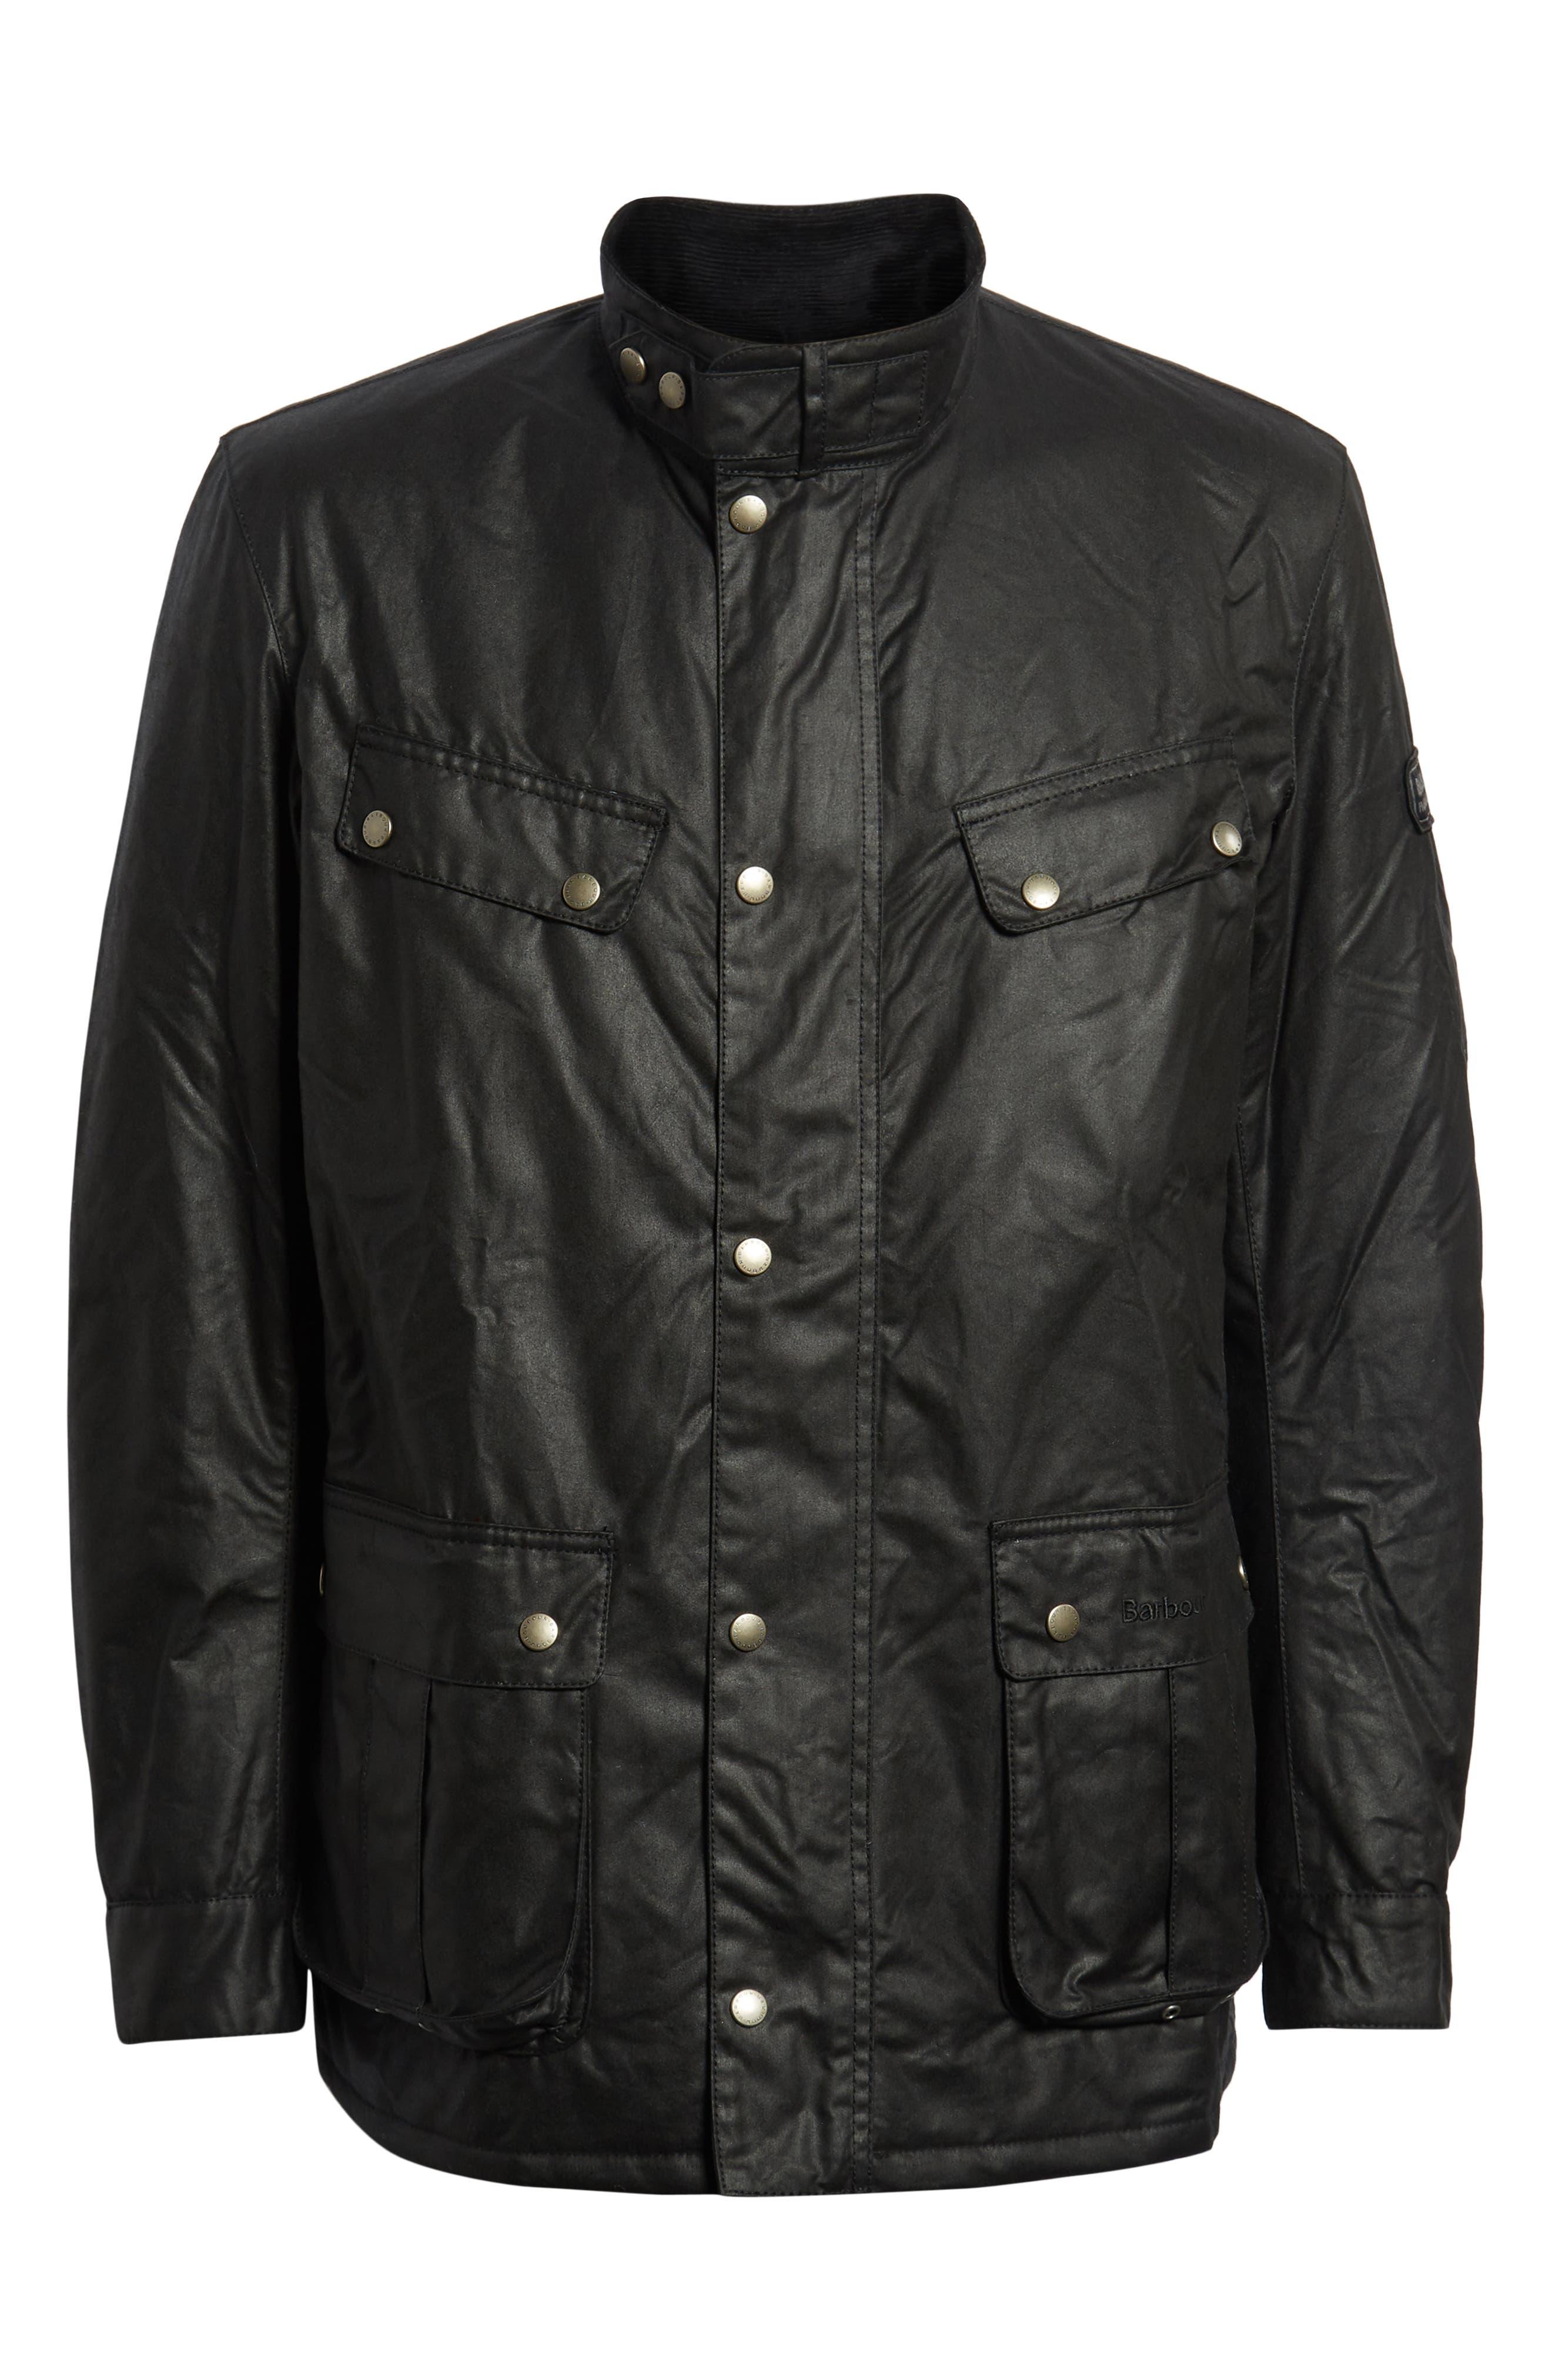 BARBOUR, 'Duke' Regular Fit Waterproof Waxed Cotton Jacket, Main thumbnail 1, color, BLACK